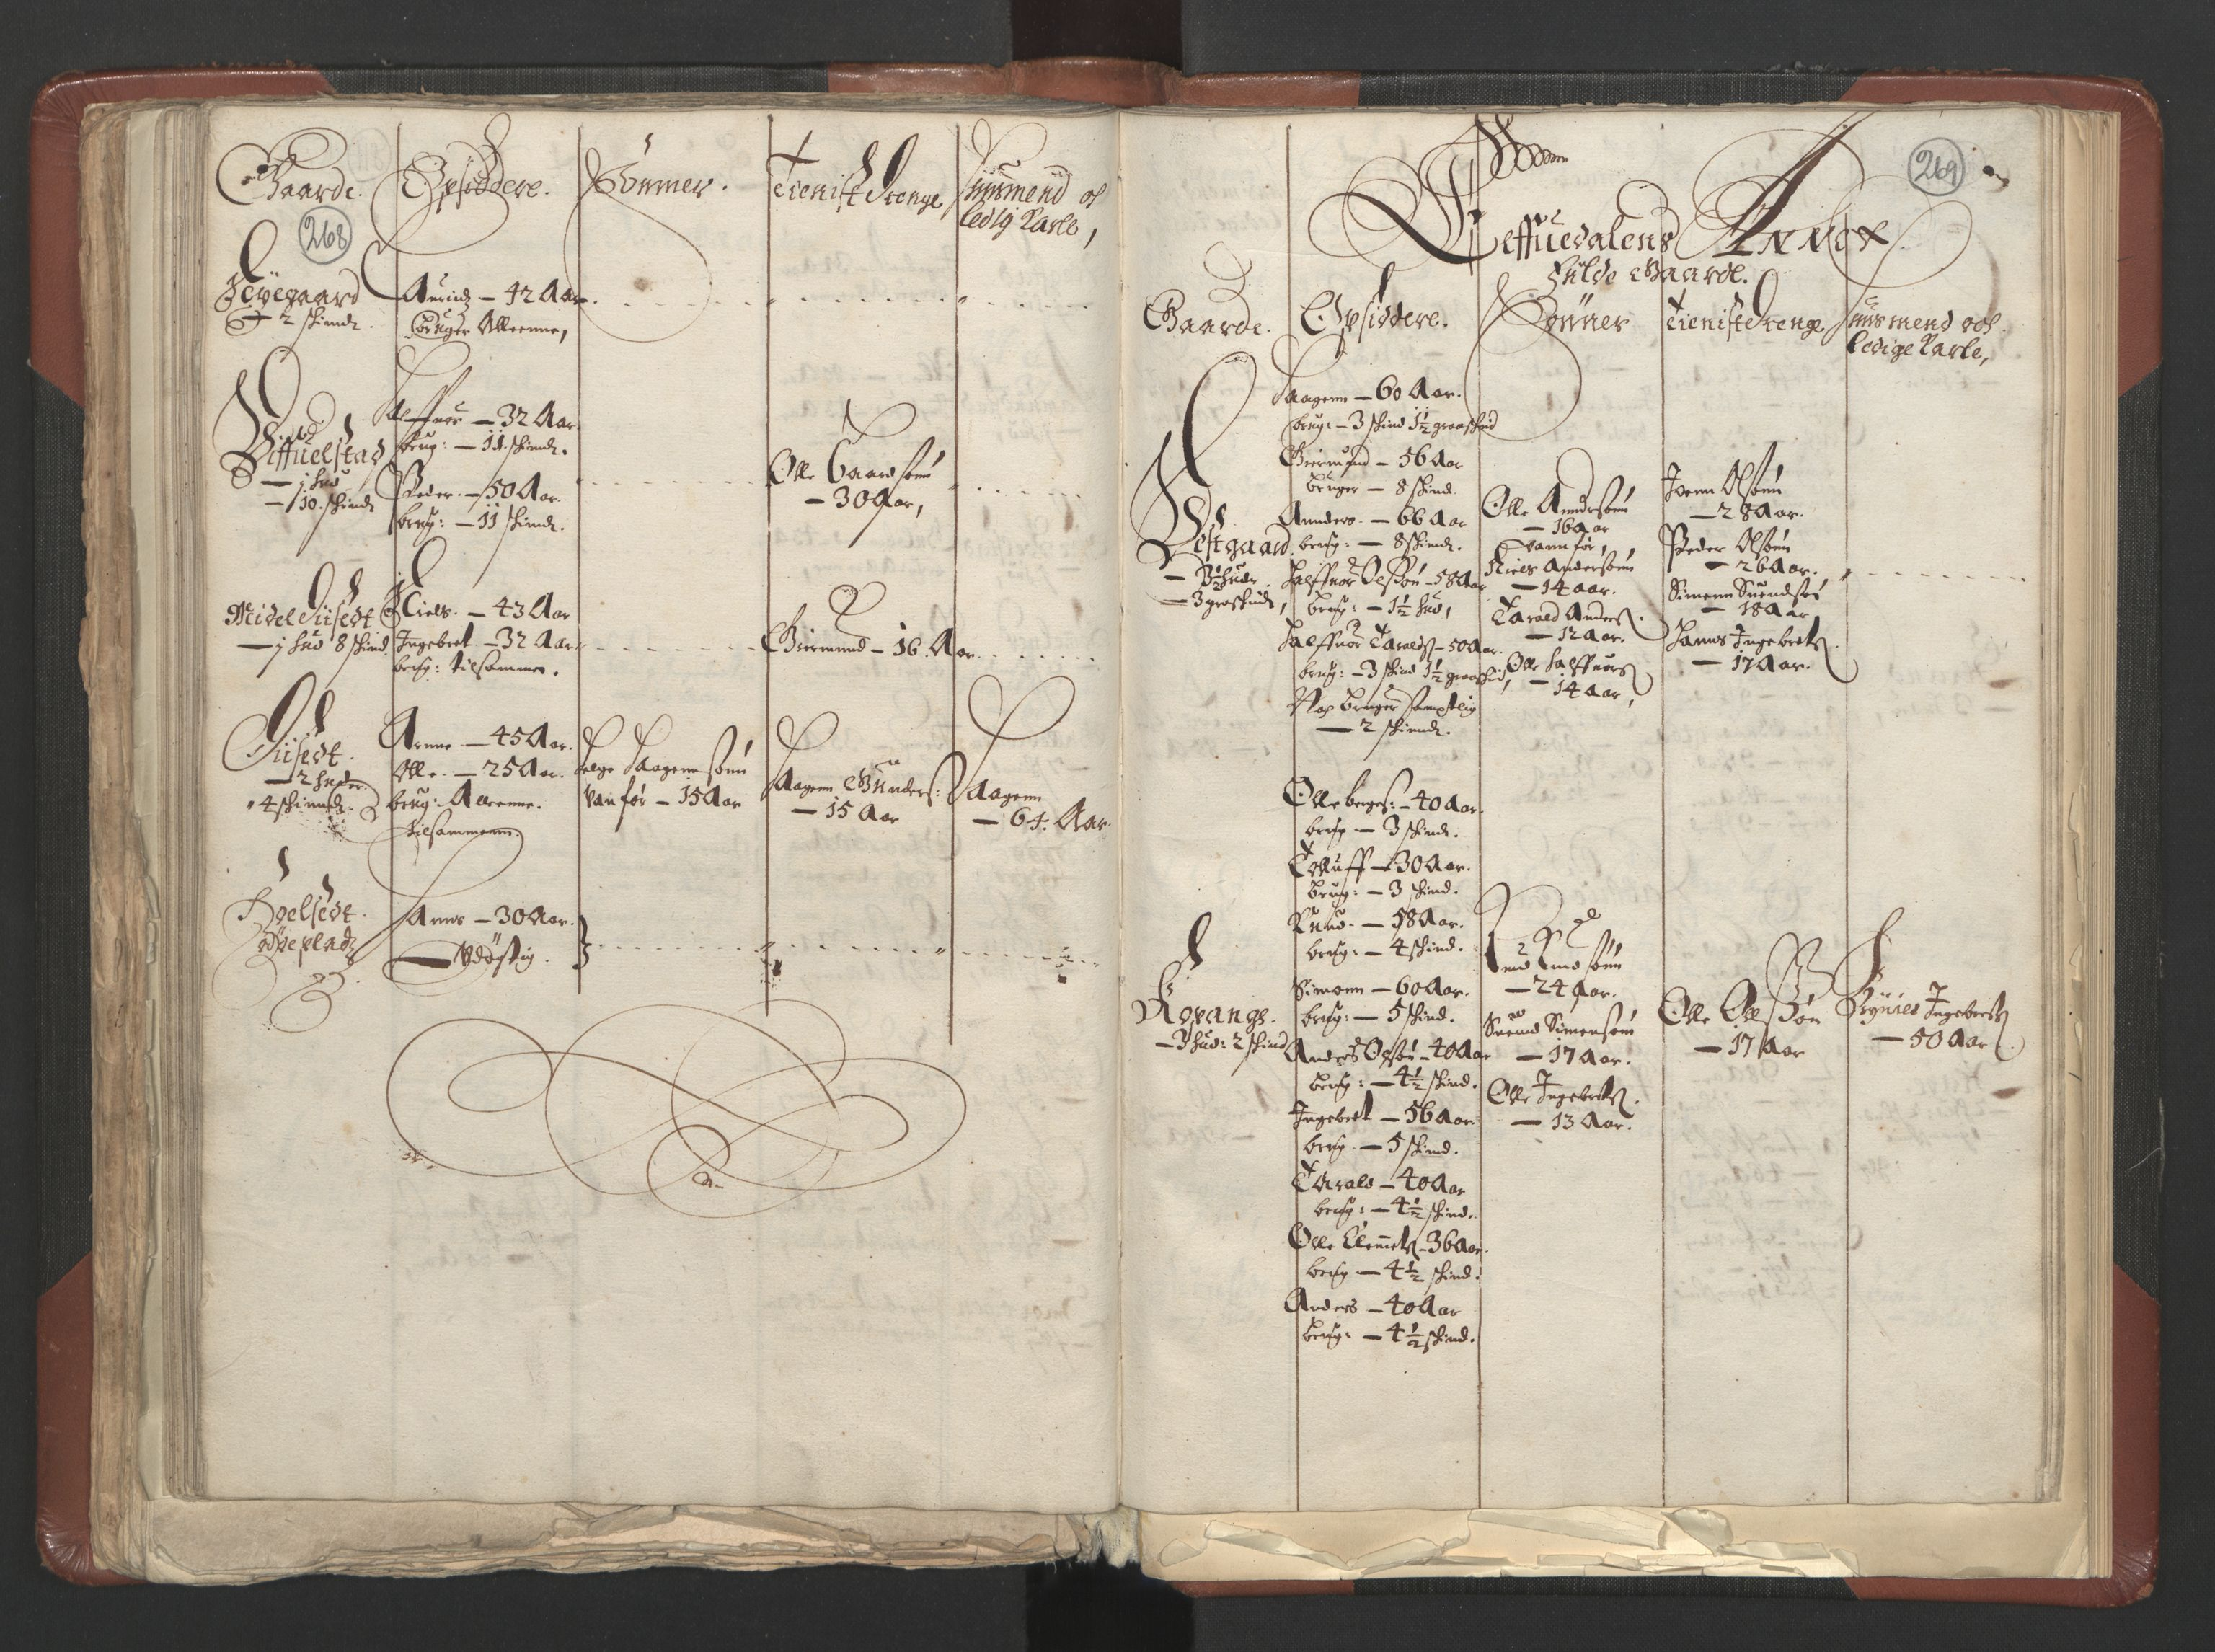 RA, Fogdenes og sorenskrivernes manntall 1664-1666, nr. 3: Hedmark fogderi og Solør, Østerdal og Odal fogderi, 1664, s. 268-269